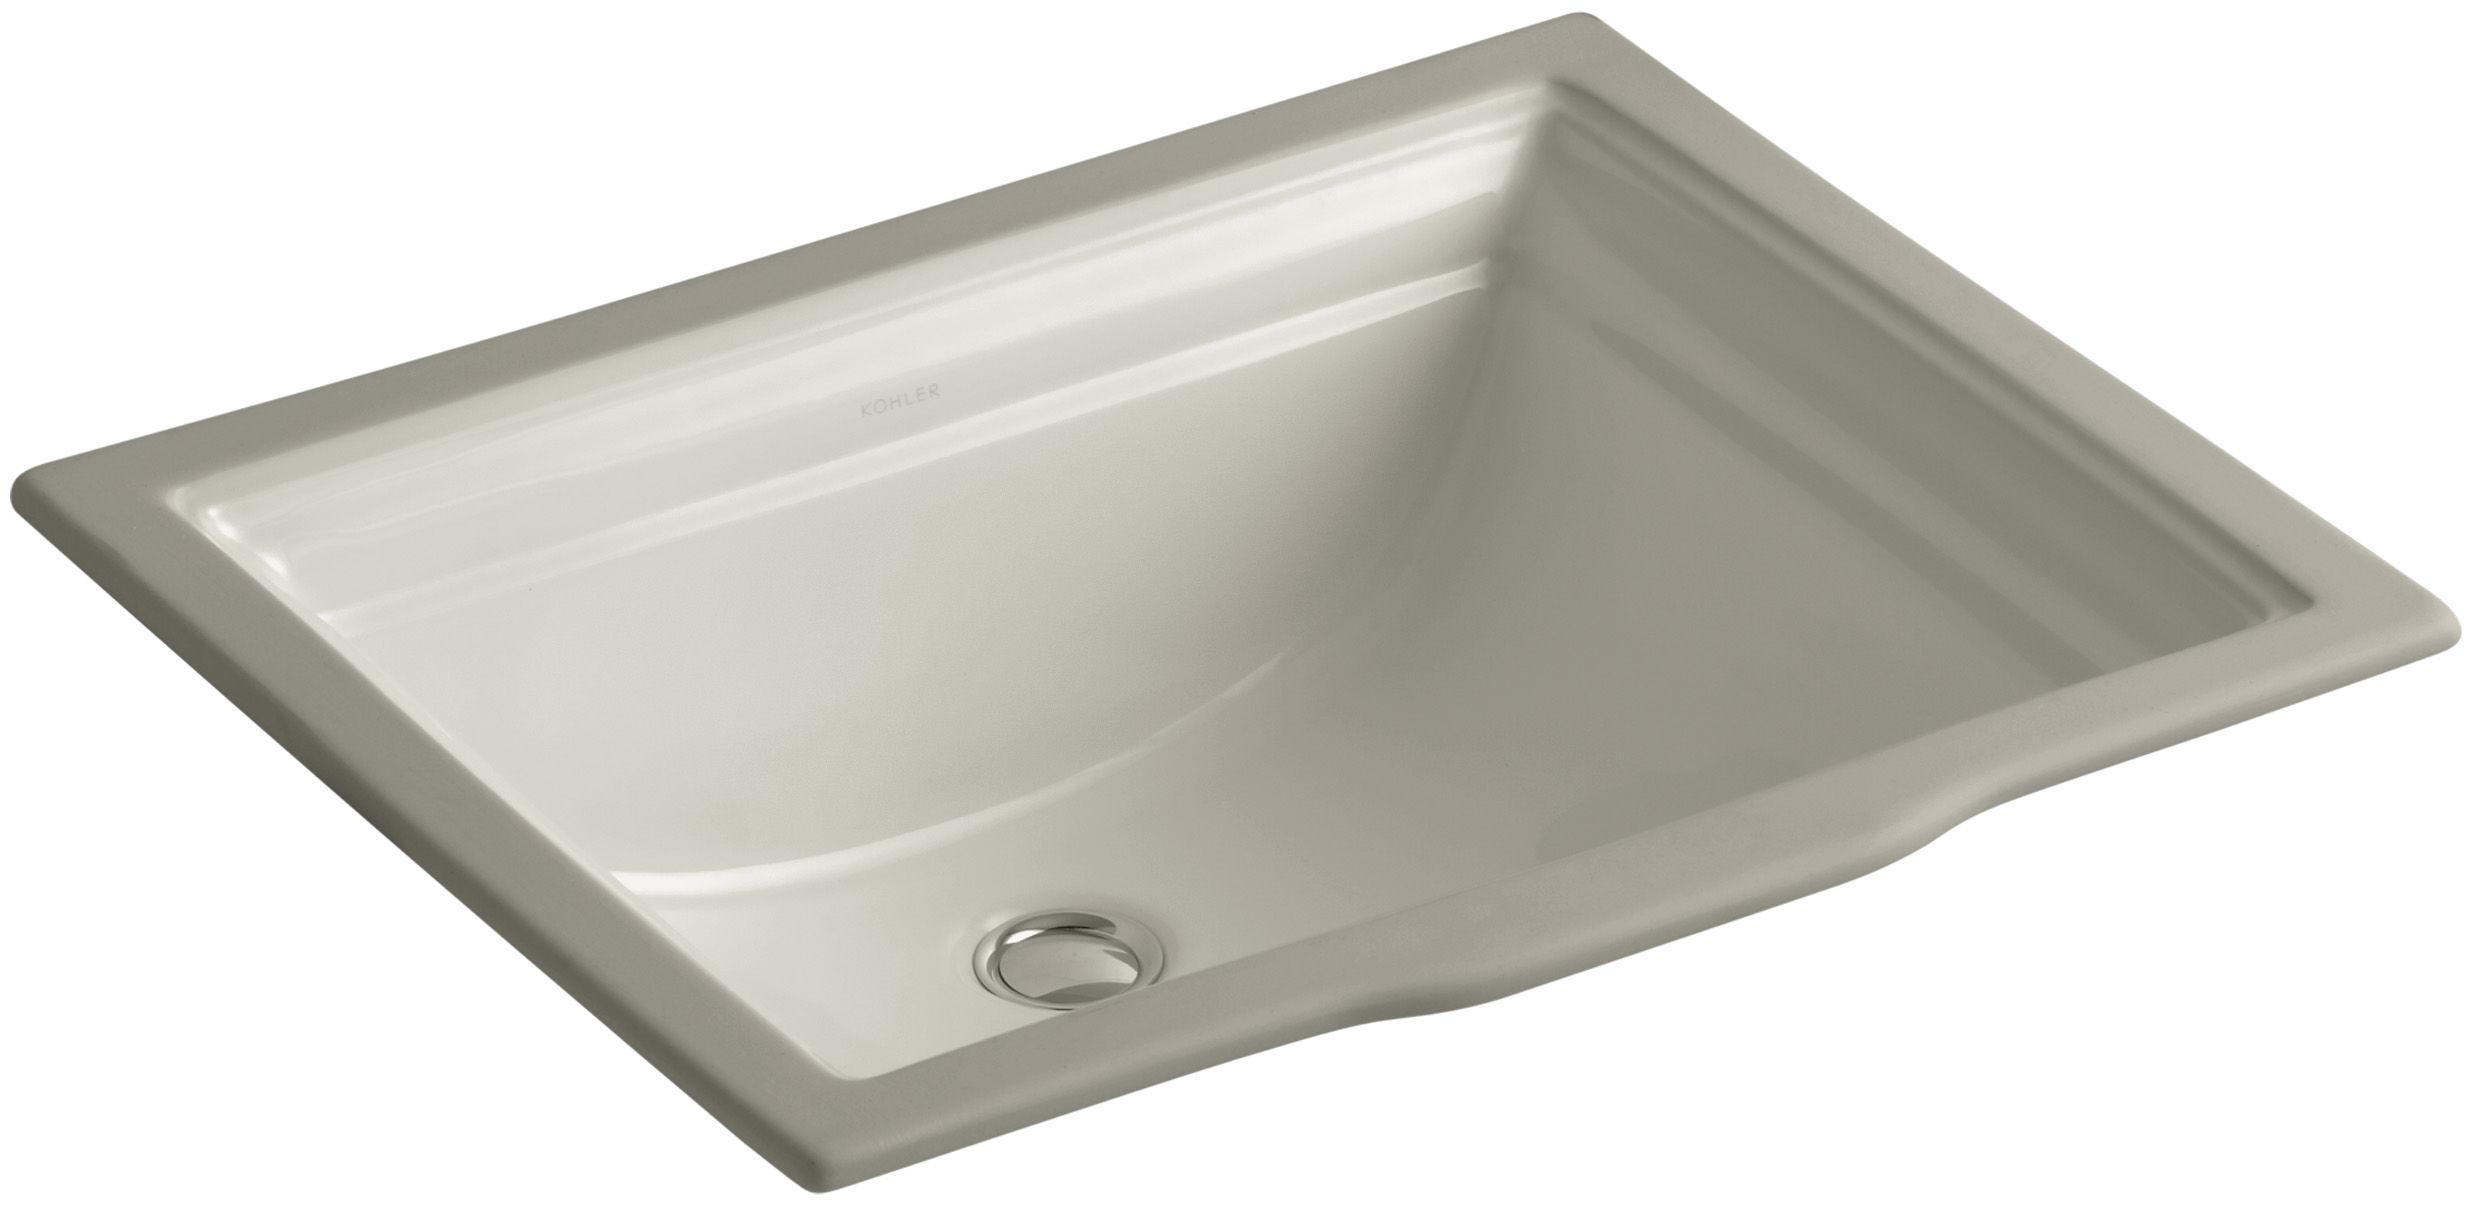 Delighted Kohler 715 Photos - The Best Bathroom Ideas - lapoup.com